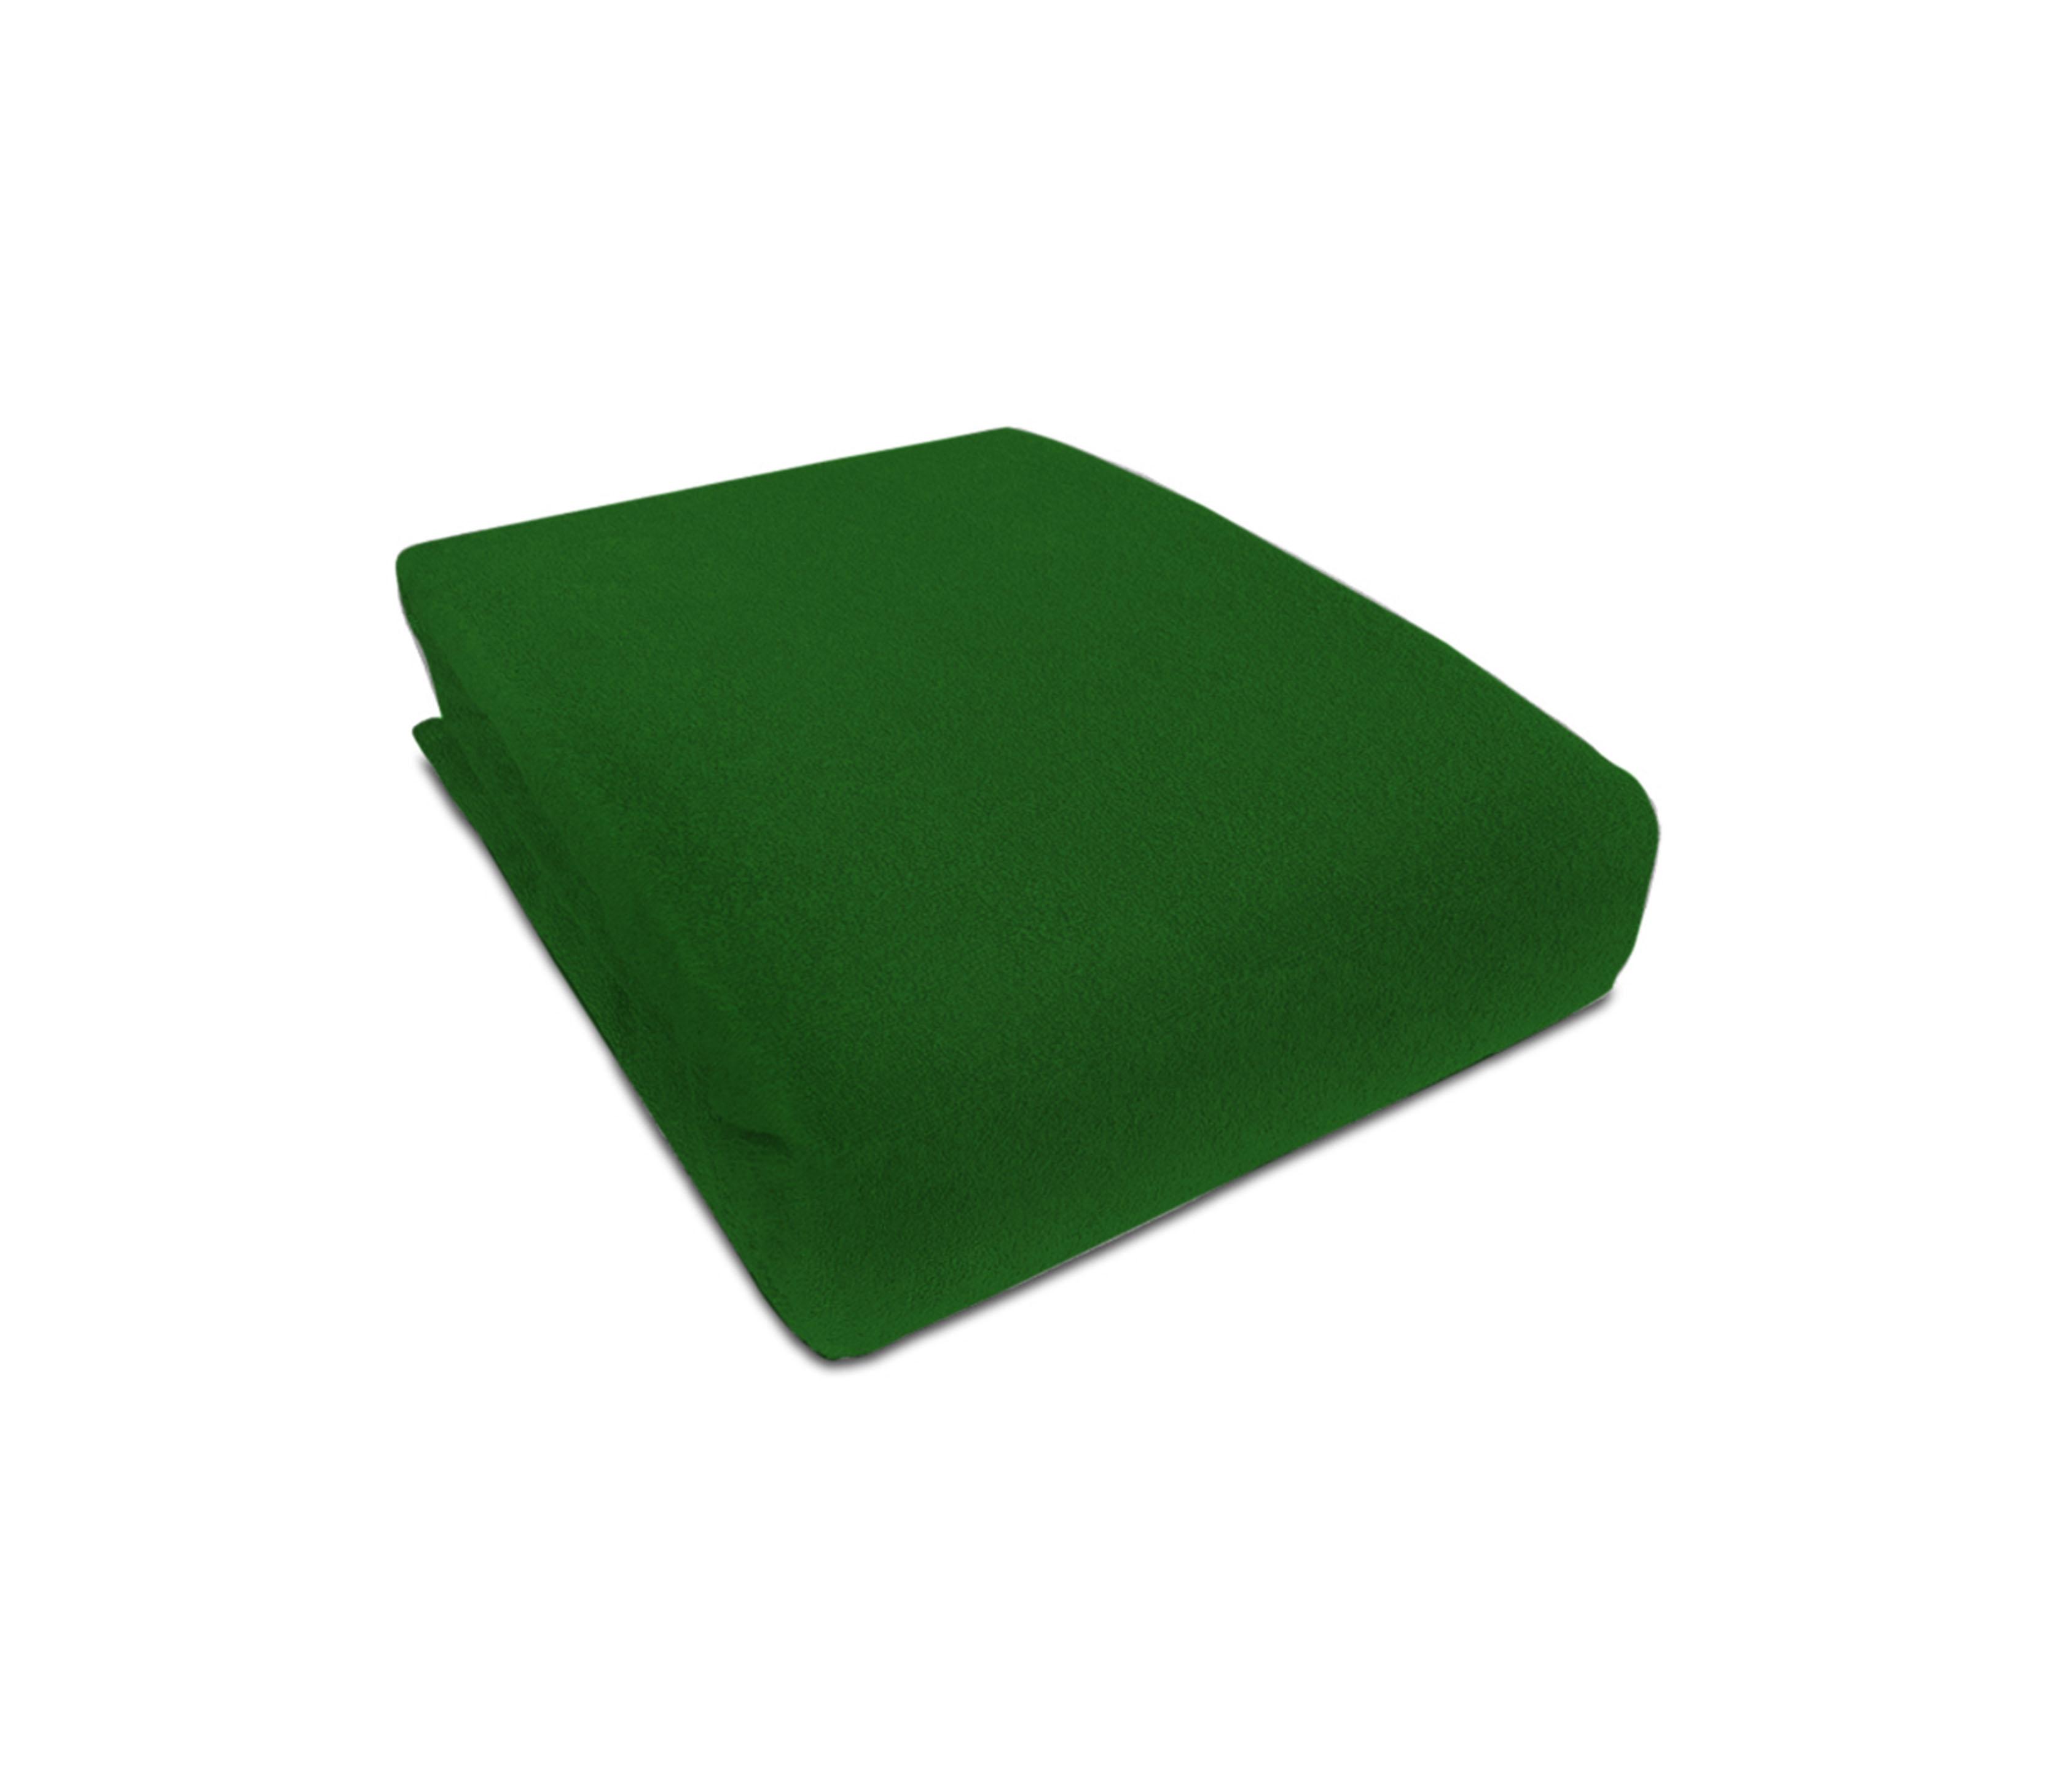 Aga Prostěradlo FROTÉ 90x200 cm Barva prostěradla: Tmavě zelená